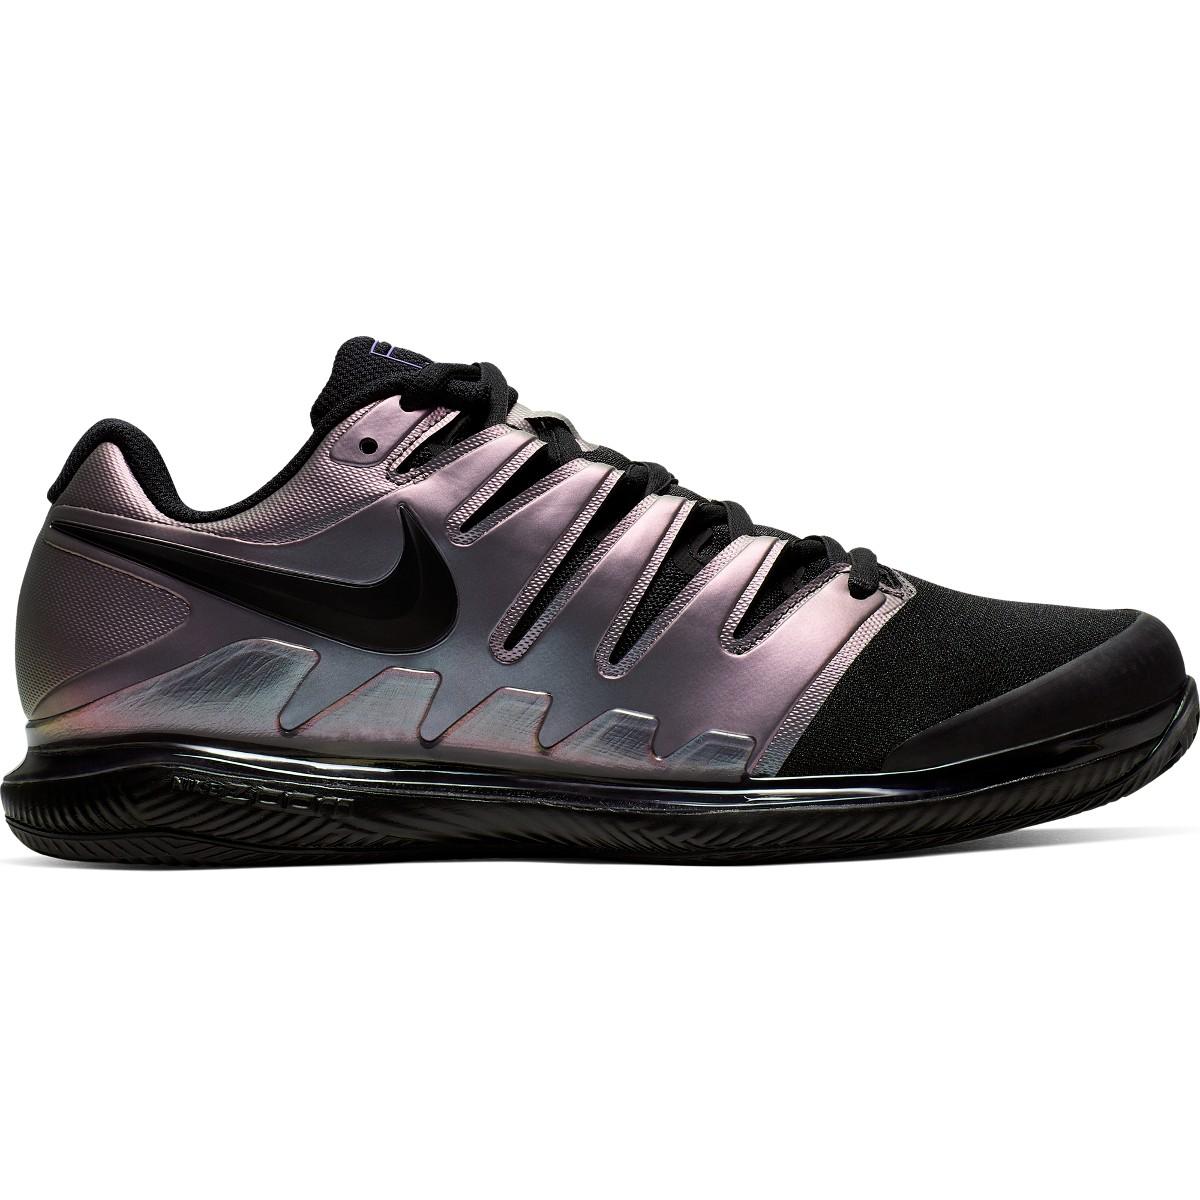 Chaussures nike air zoom vapor 10 terre battue